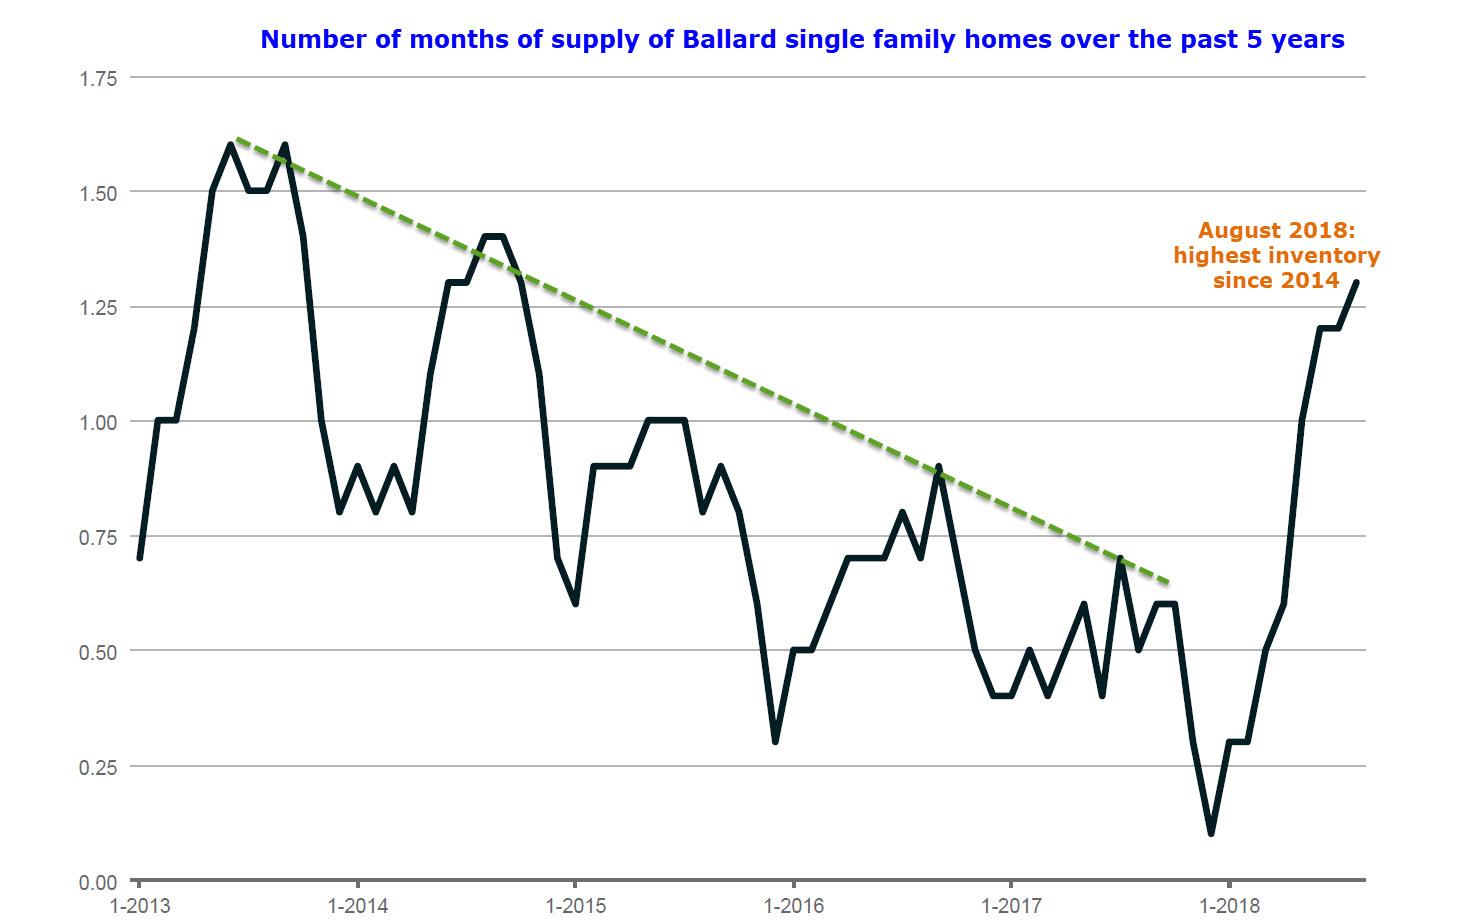 Ballard housing inventory trend